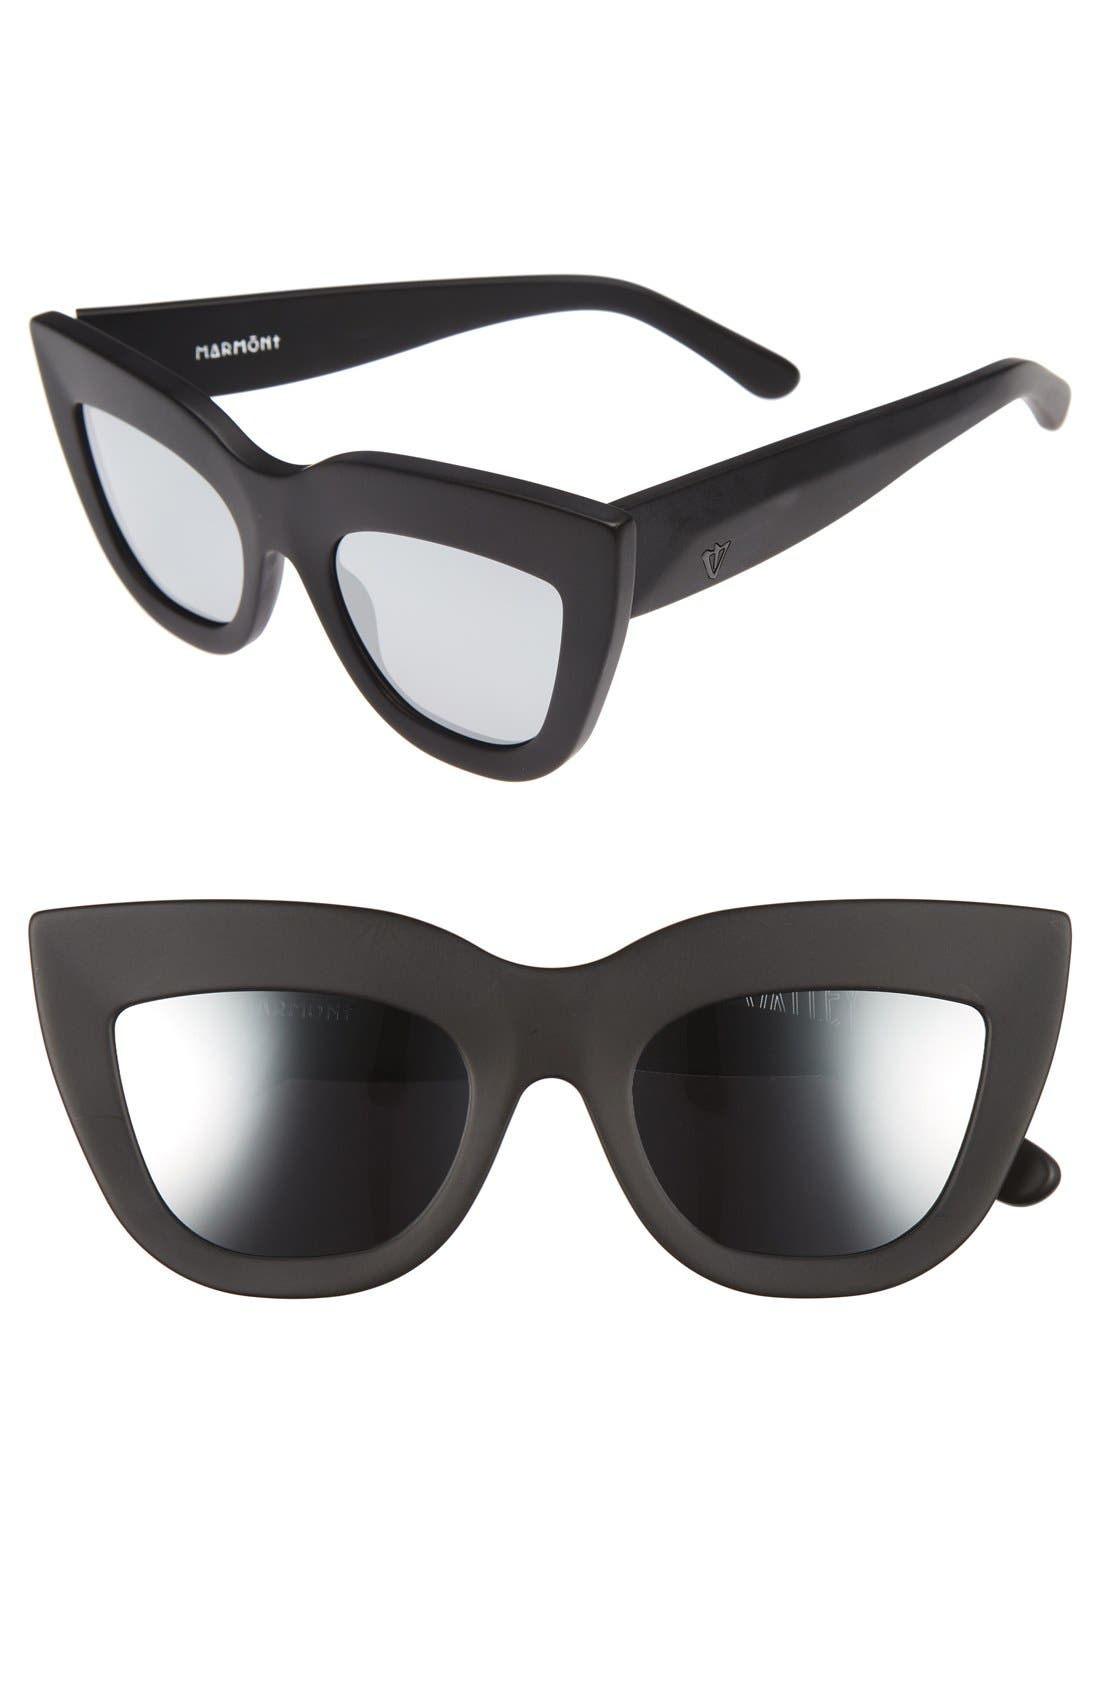 Marmont 52mm Cat Eye Sunglasses,                             Main thumbnail 1, color,                             001